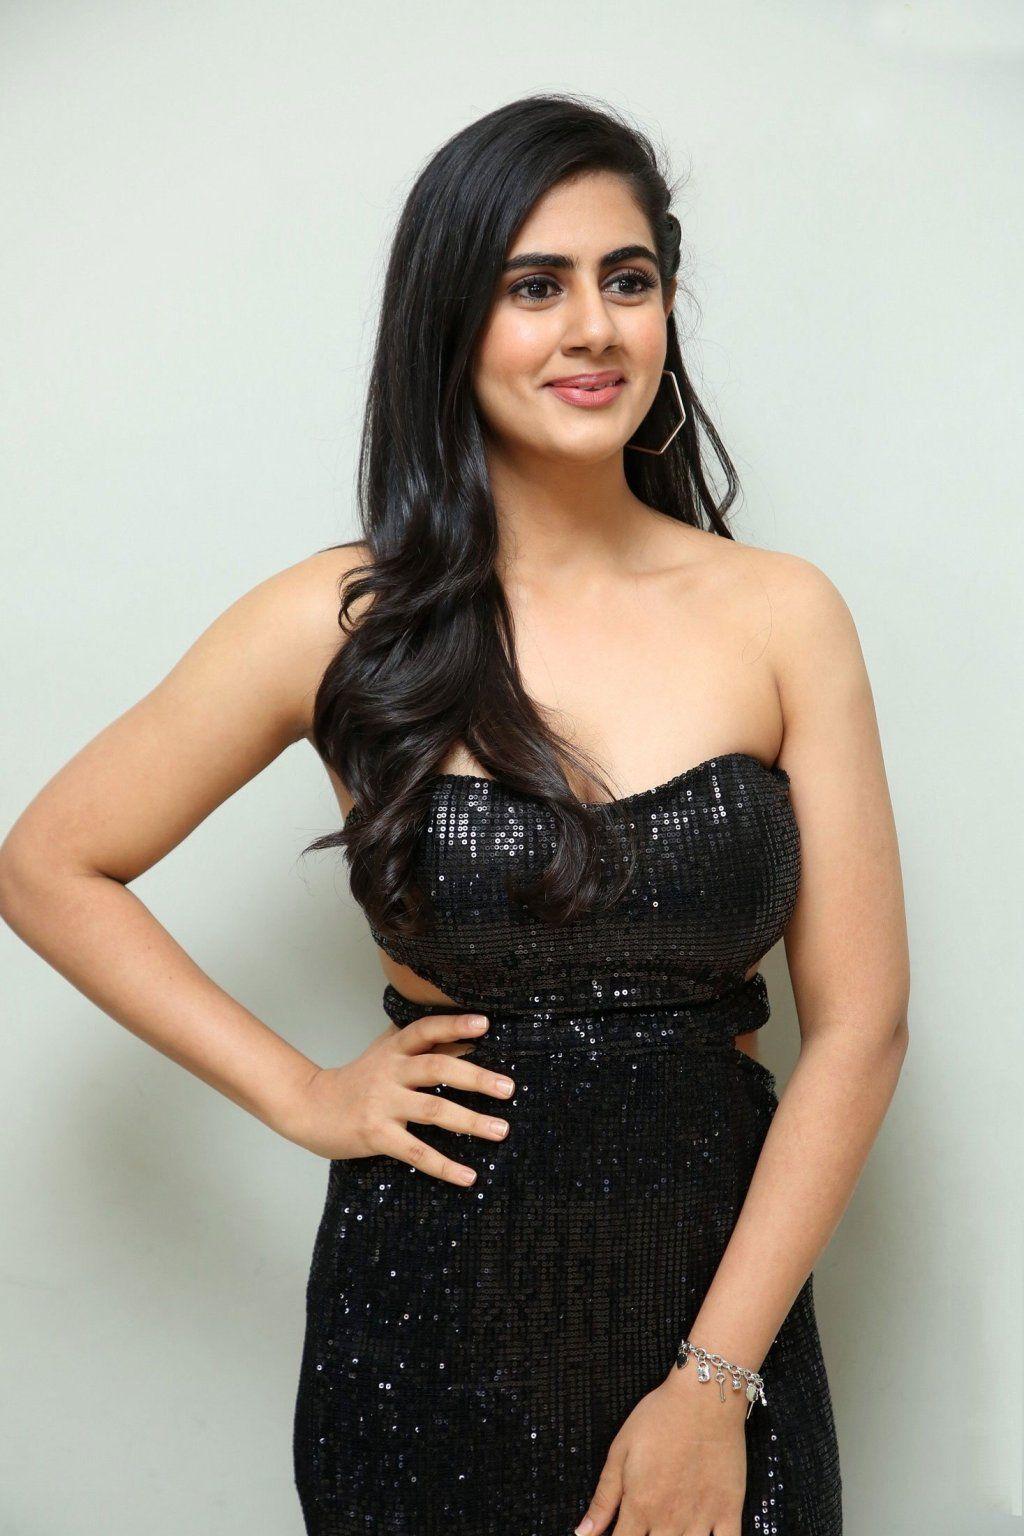 Southindian Actress Gehna Sippy. ACTRESSMEDIA in 2020